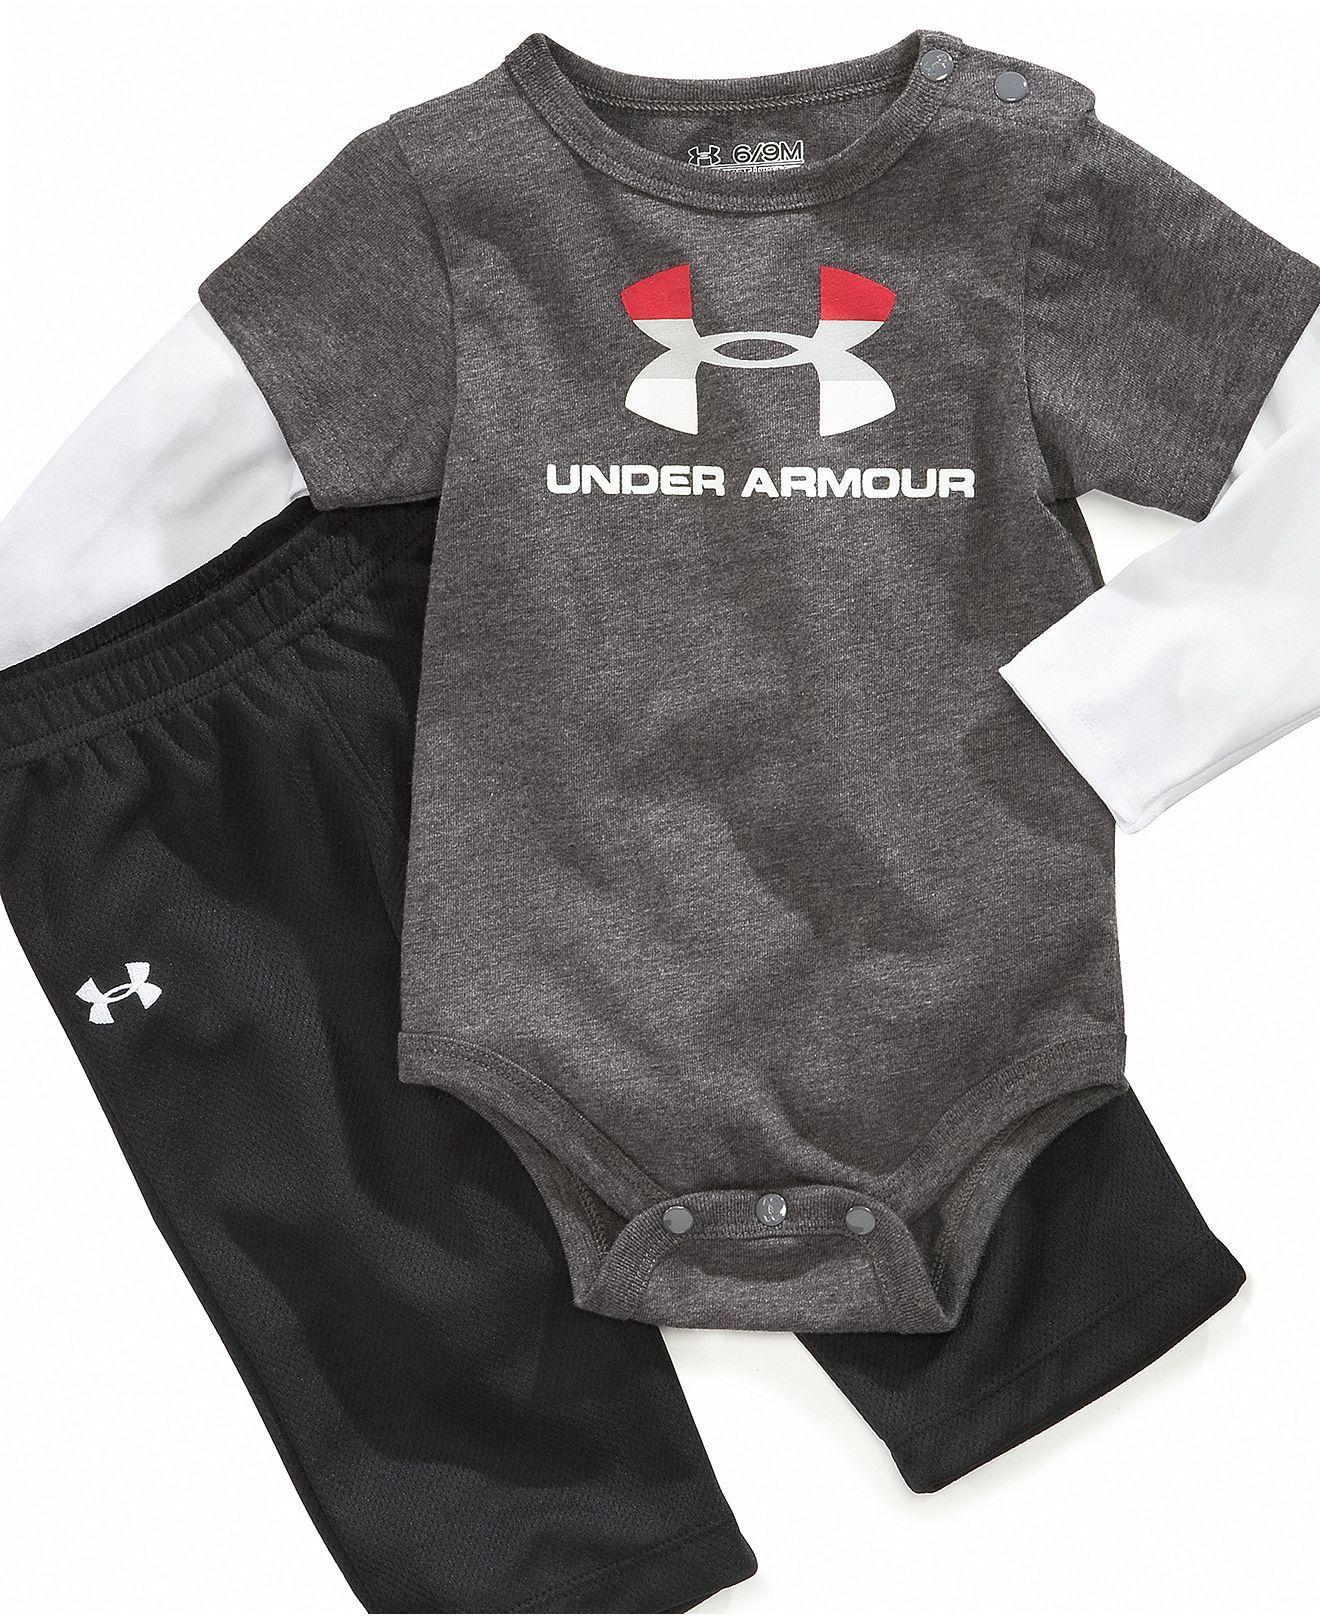 213da8731d Under Armour Baby Set, Baby Boys Bodysuit and Pants Set - Kids ...